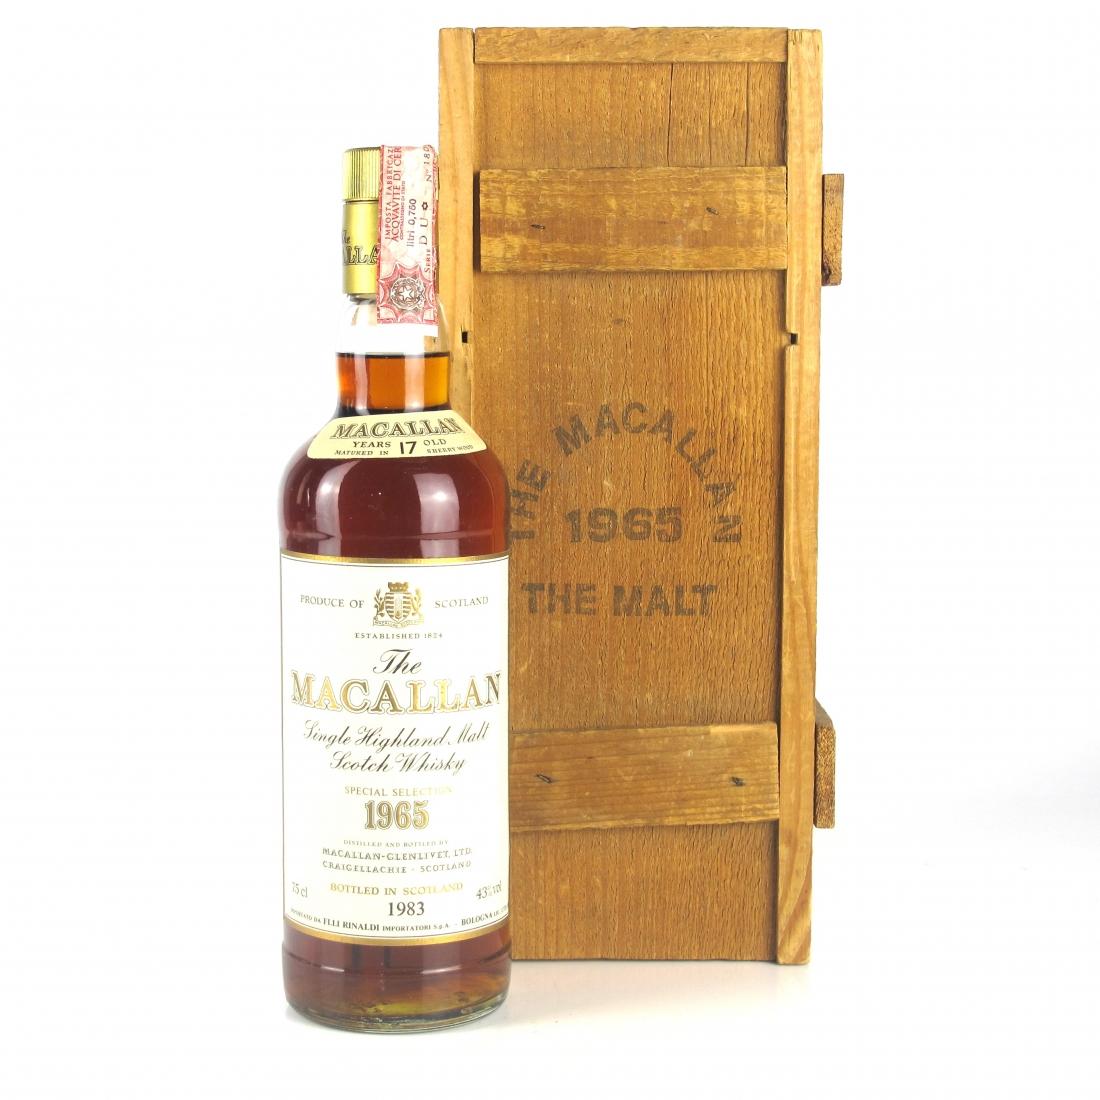 Macallan 1965 17 Year Old / Rinaldi Import